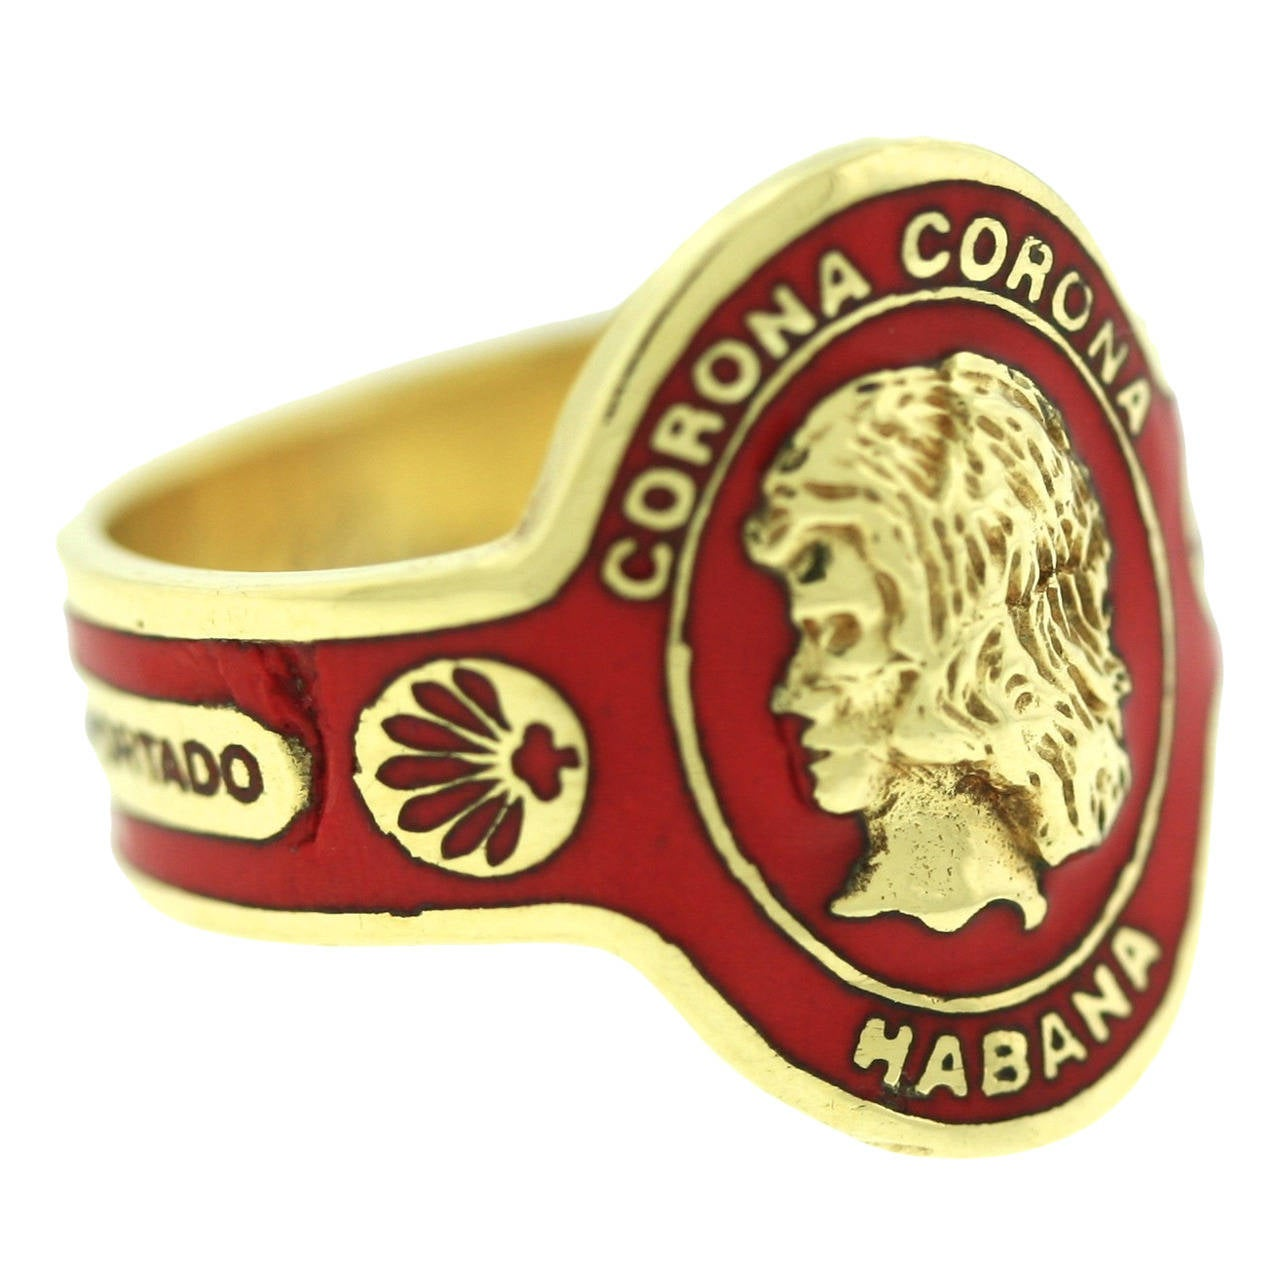 1970s cartier enamel gold cigar band ring at 1stdibs